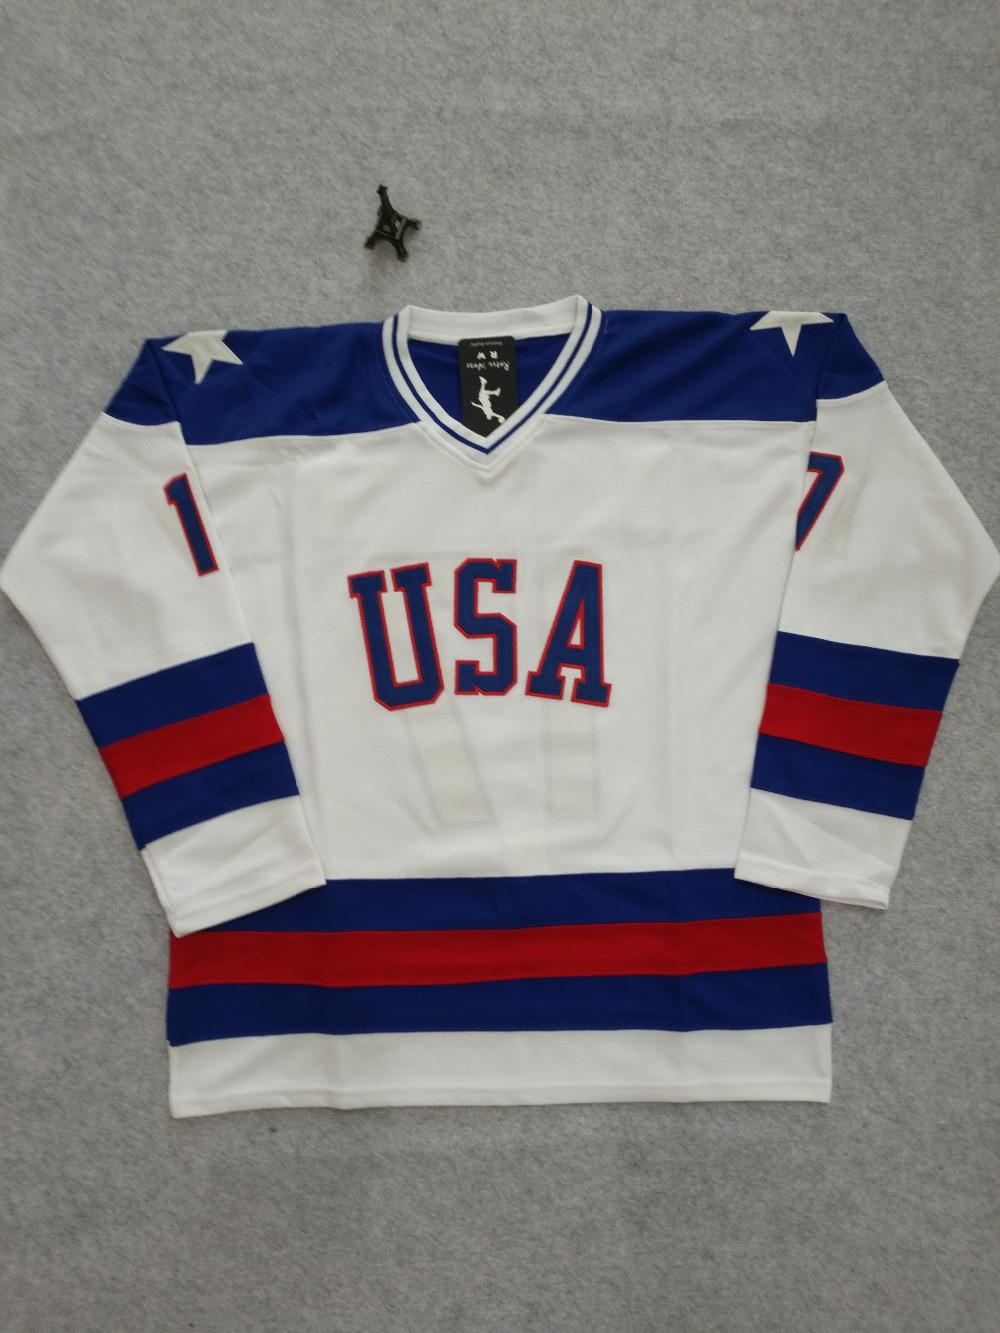 SexeMara 1980 Miracle On Ice Jack O'Callahan 17 USA Hockey Jersey White Blue S-XXXL Free Shipping(China (Mainland))